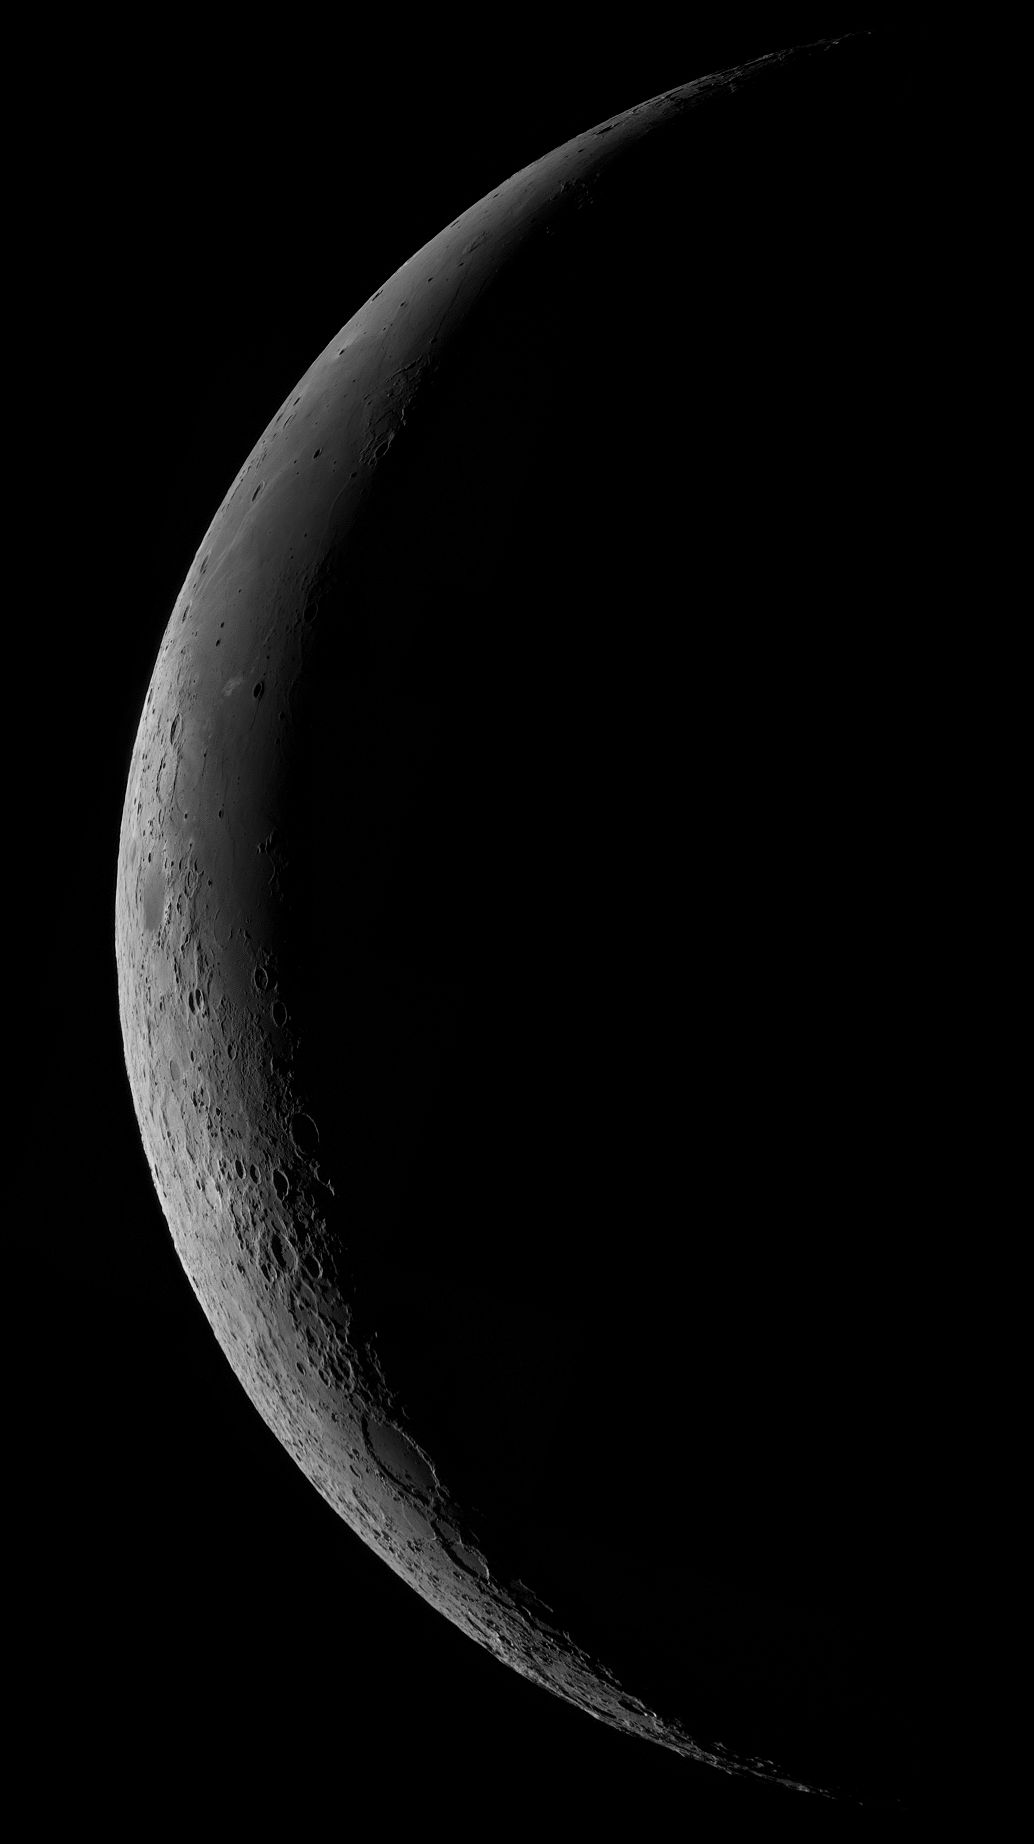 Moon_041218_p50c.jpg